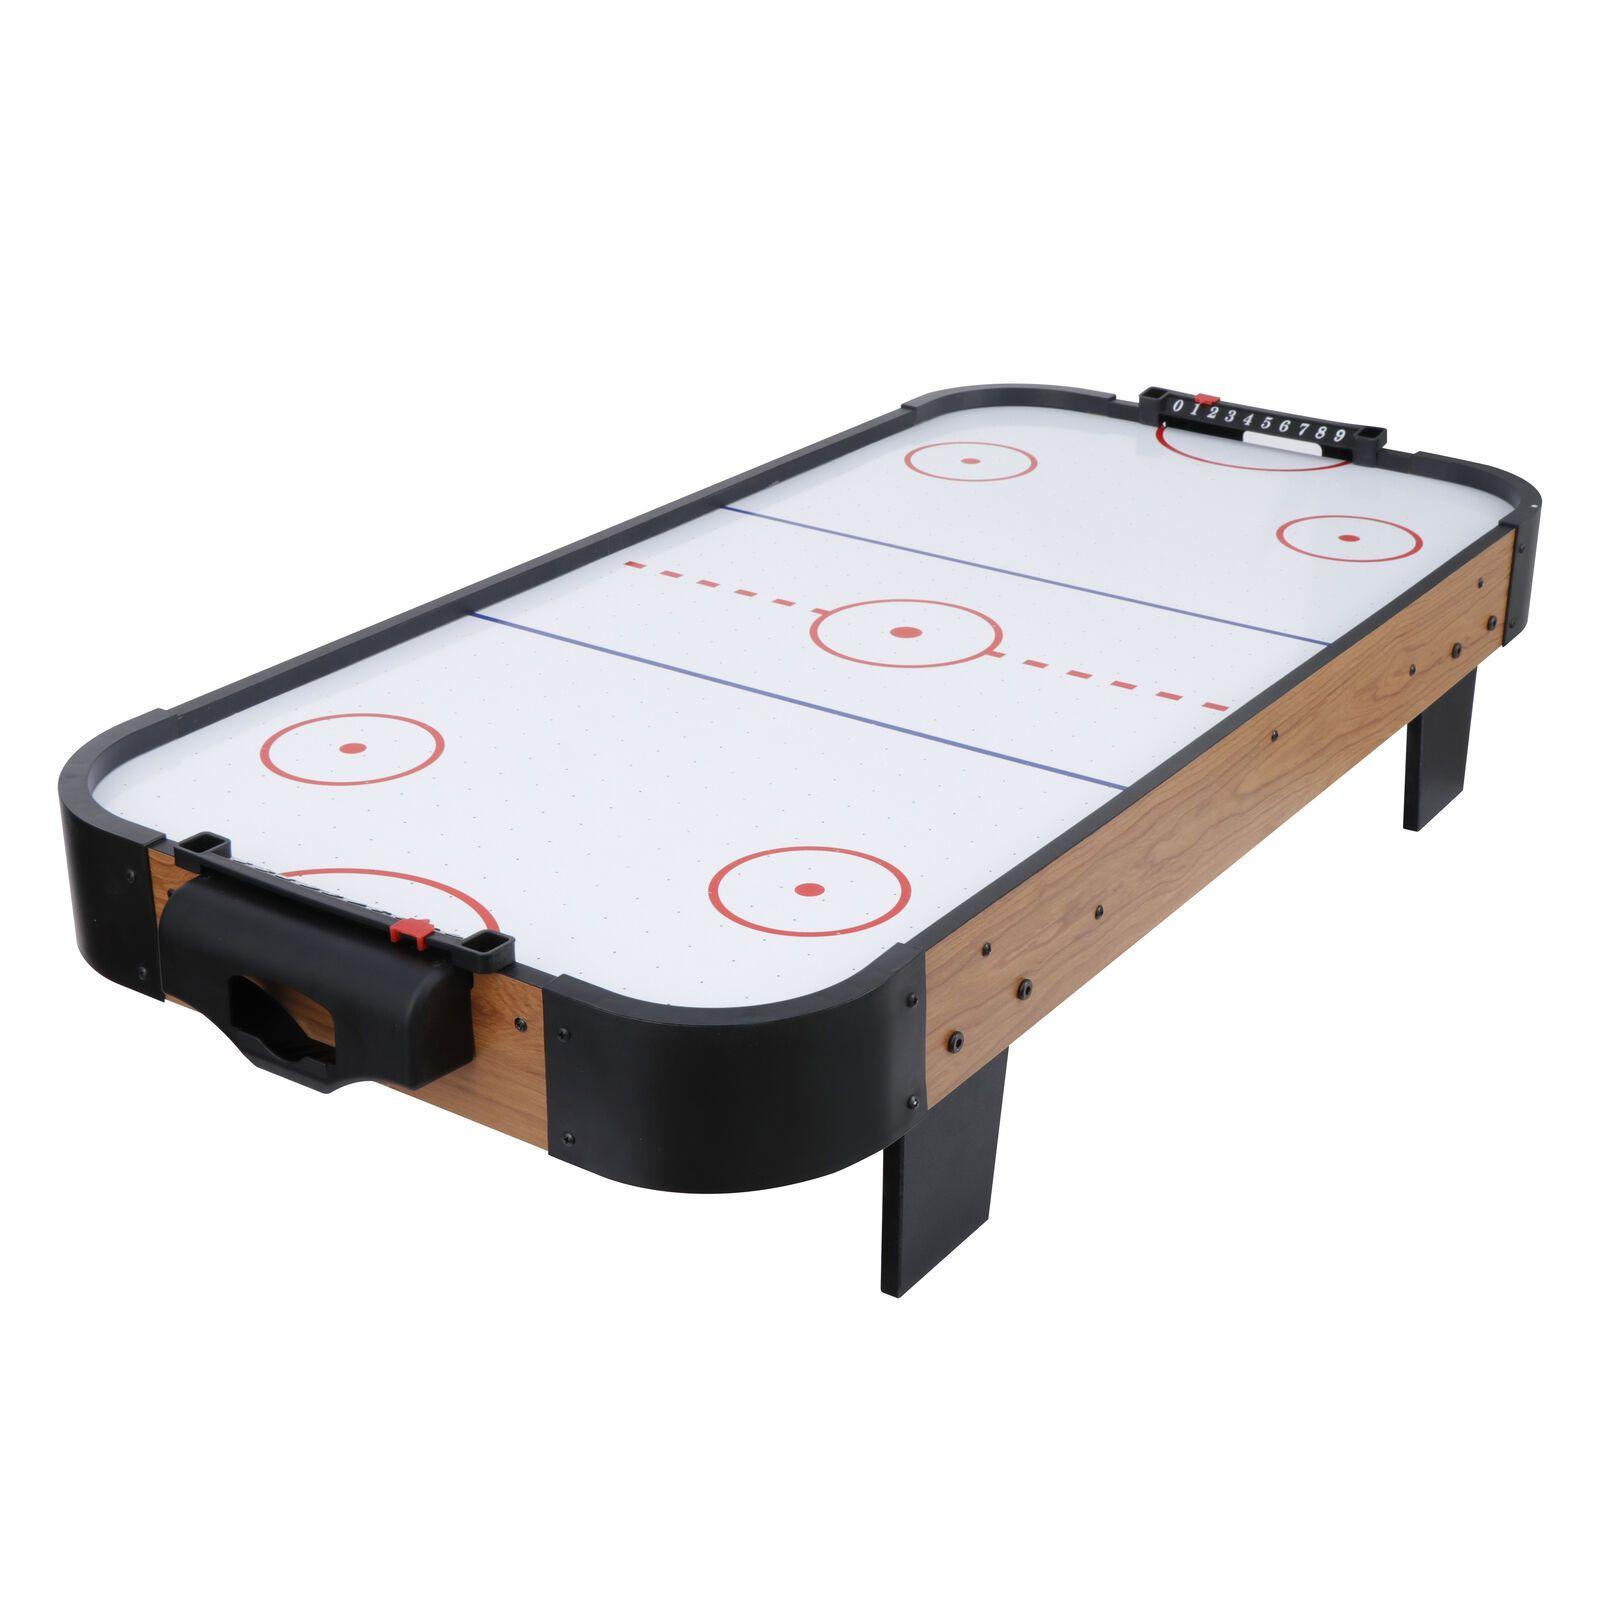 40 Inch Table Top Air Hockey Game Fun Kids Teens Adults Party Indoor Gifts In 2020 Air Hockey Air Hockey Games Air Hockey Table